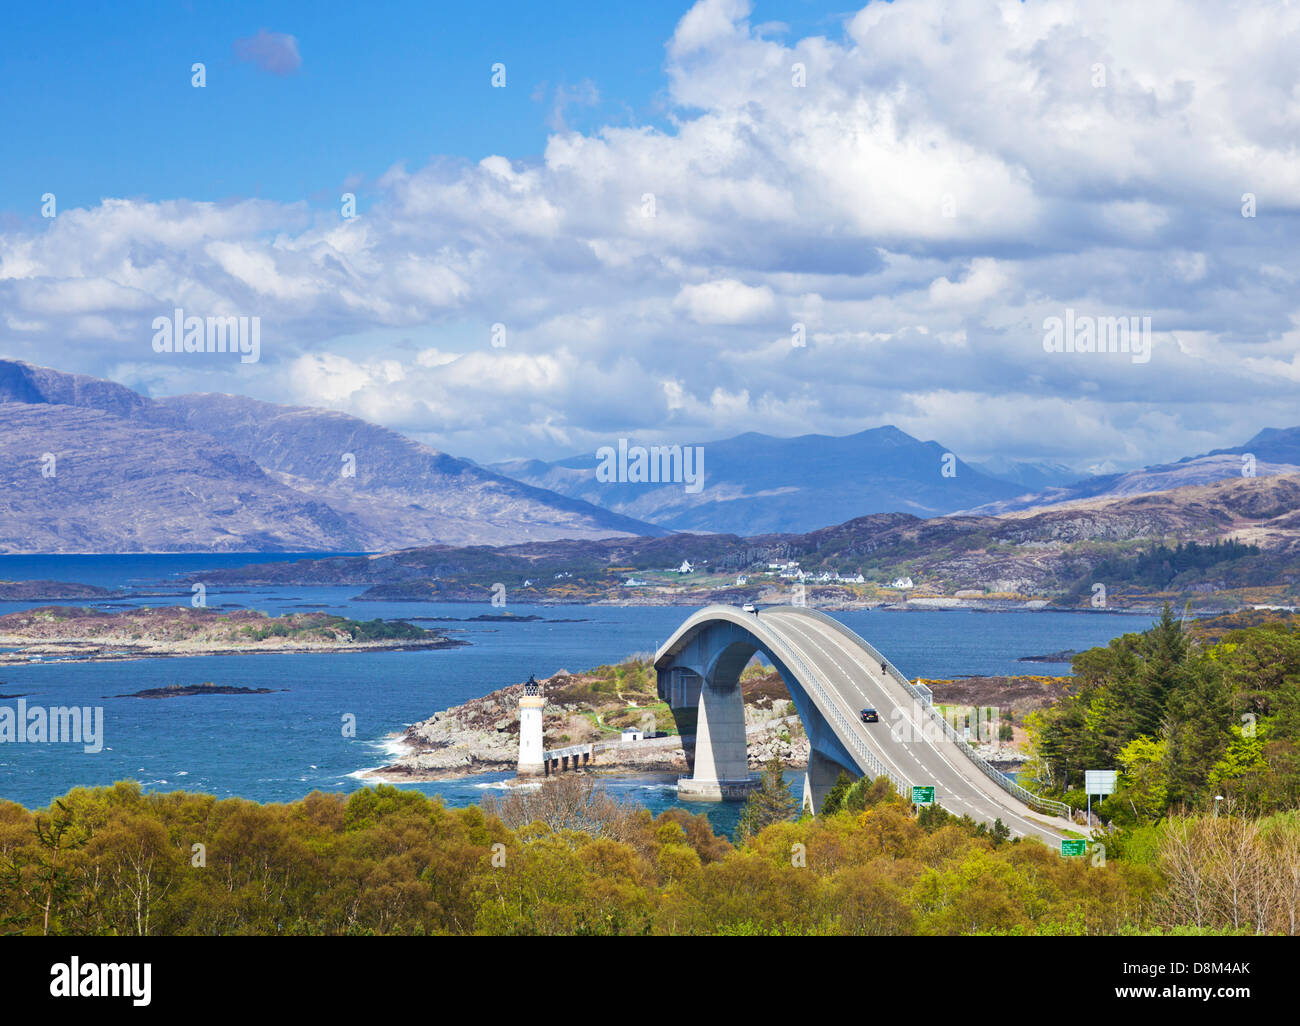 The Skye bridge connecting the scottish mainland with the Isle of Skye Highlands and Islands Scotland UK GB EU Europe - Stock Image